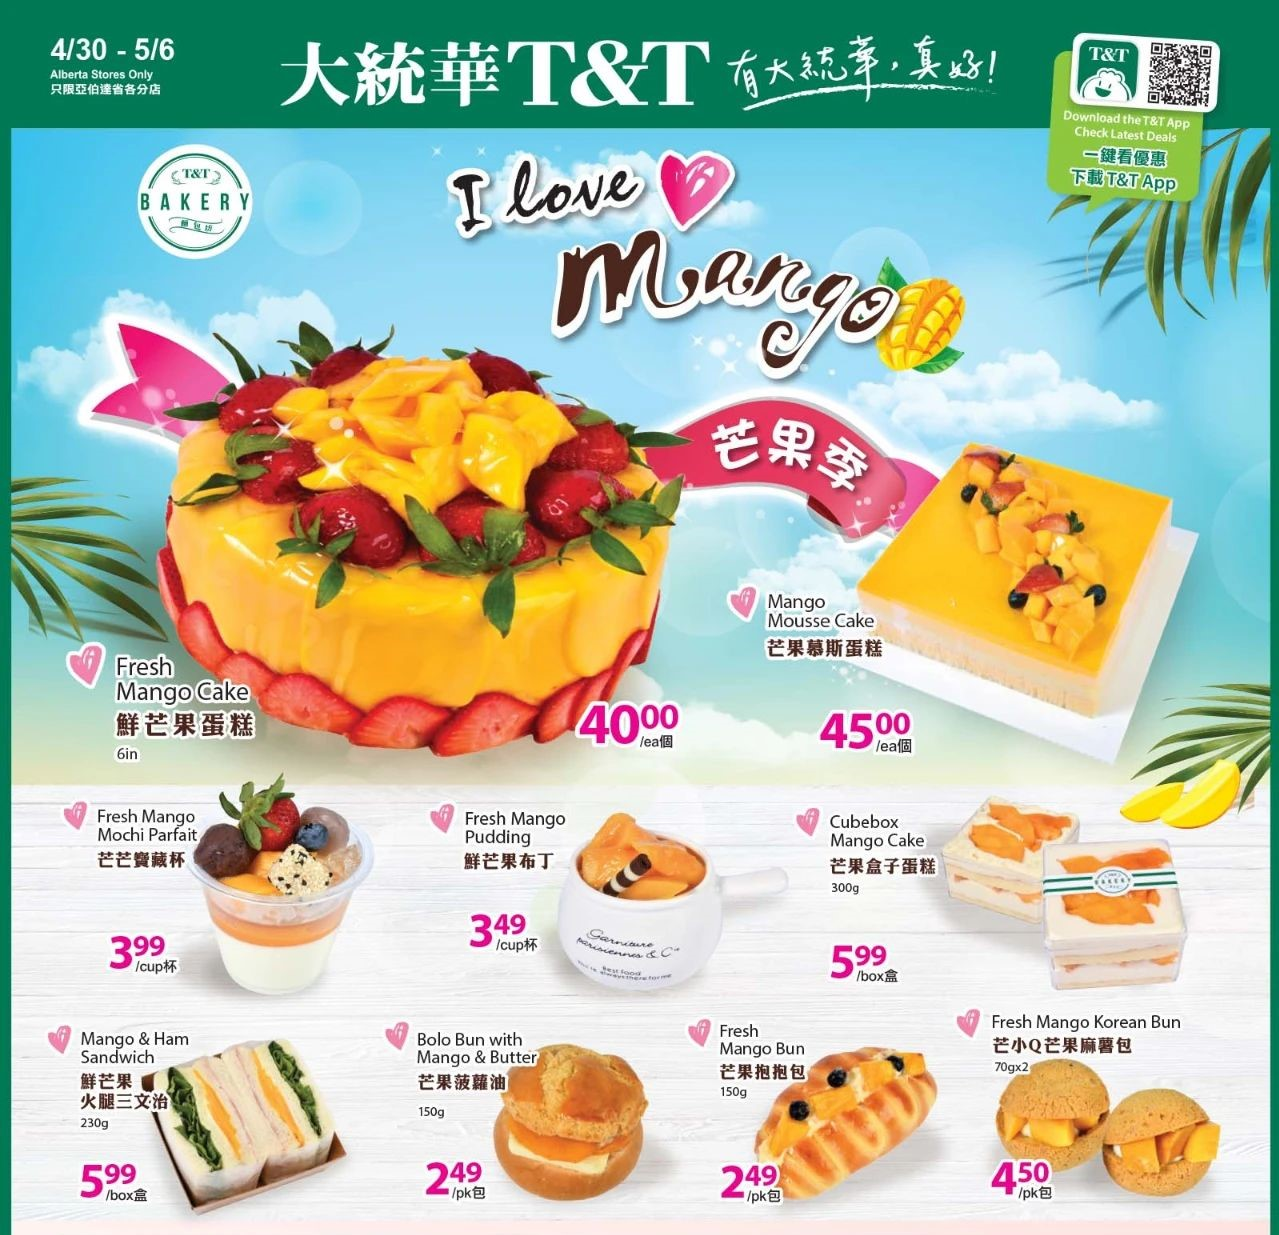 TNT Supermarket AB Flyer Apr 30